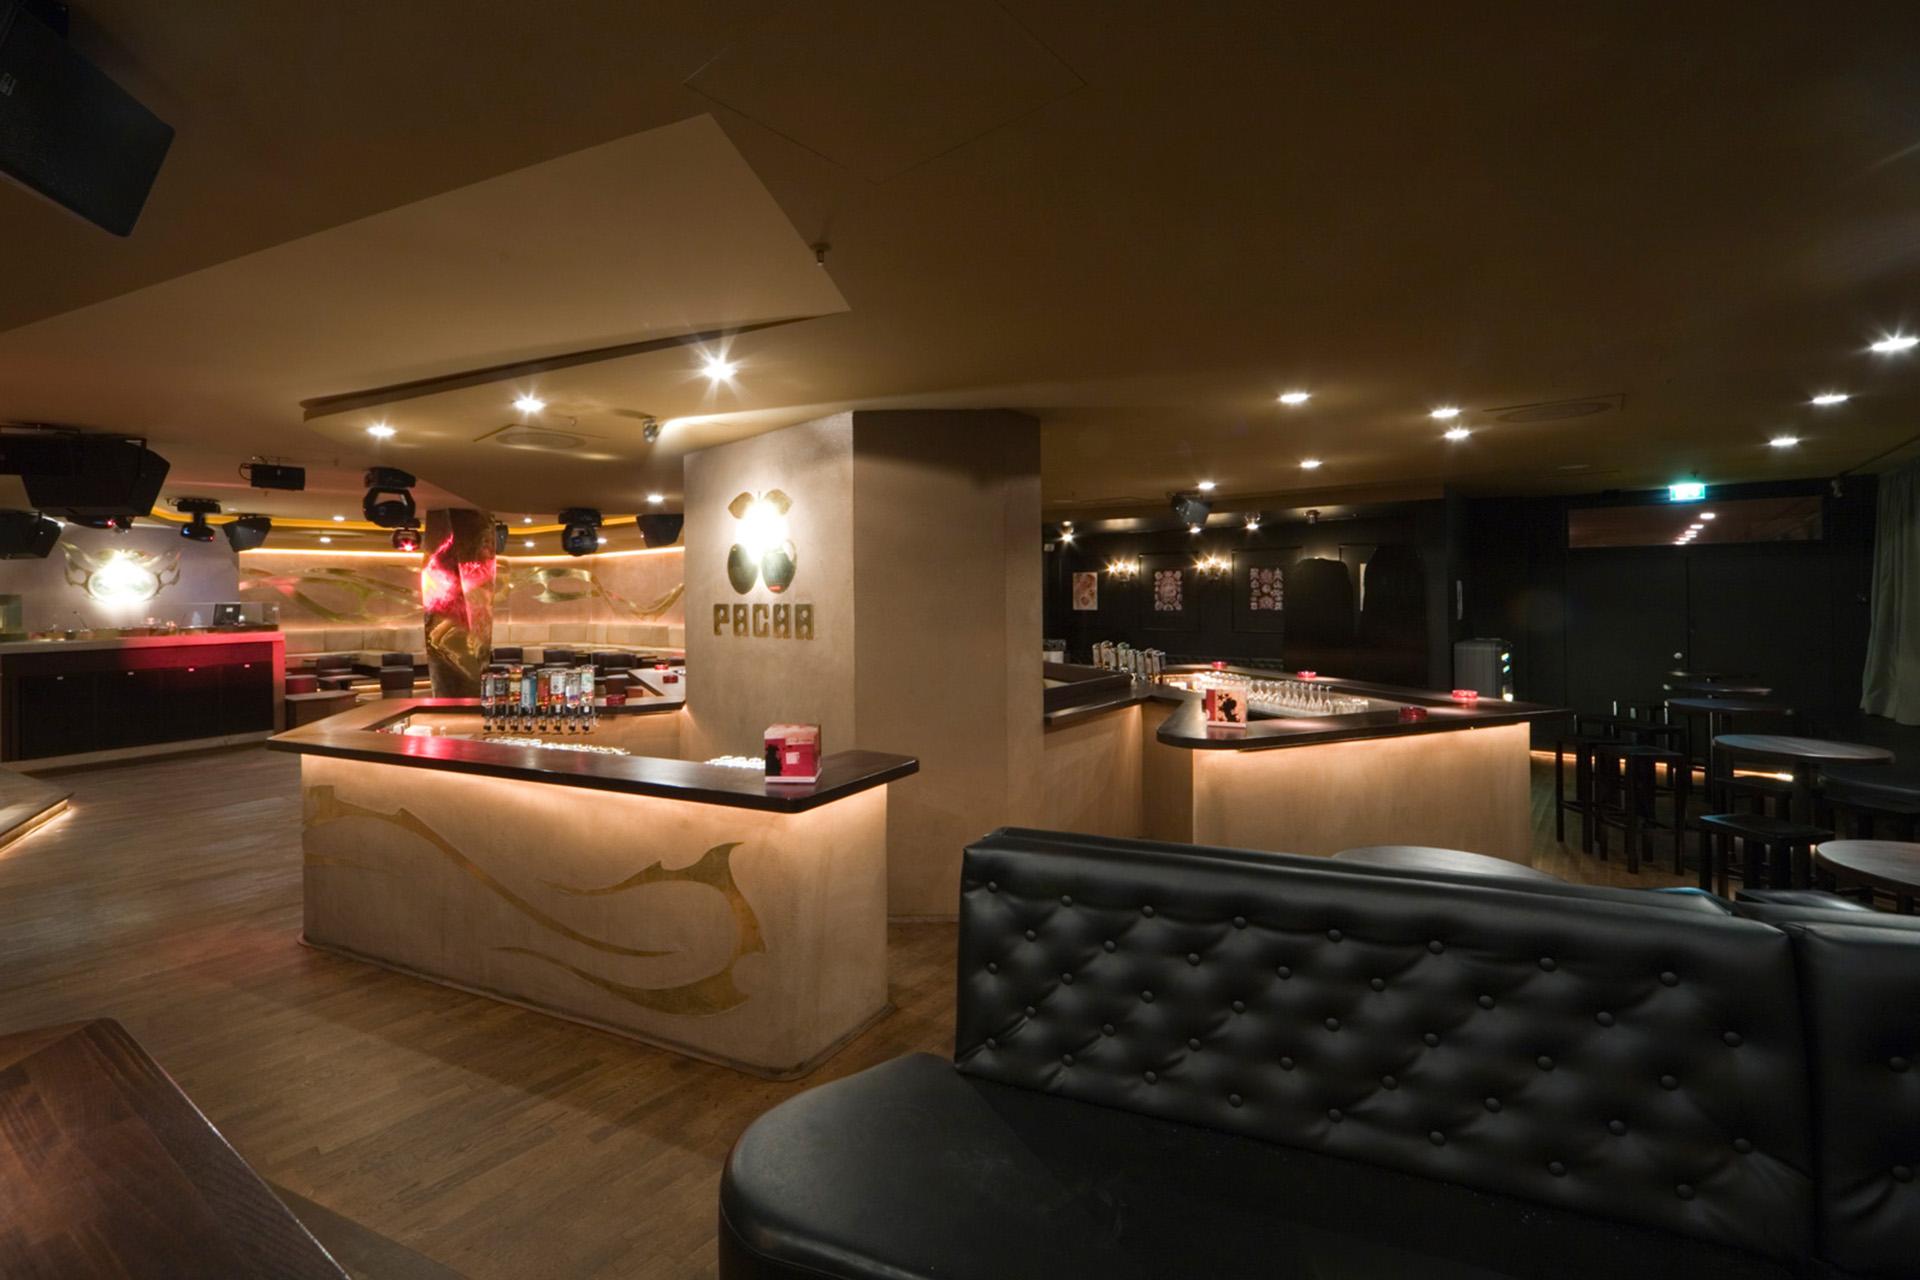 005-interior-design-hospitality-night-club-bar-pacha-muenchen-buero-philipp-moeller.jpg